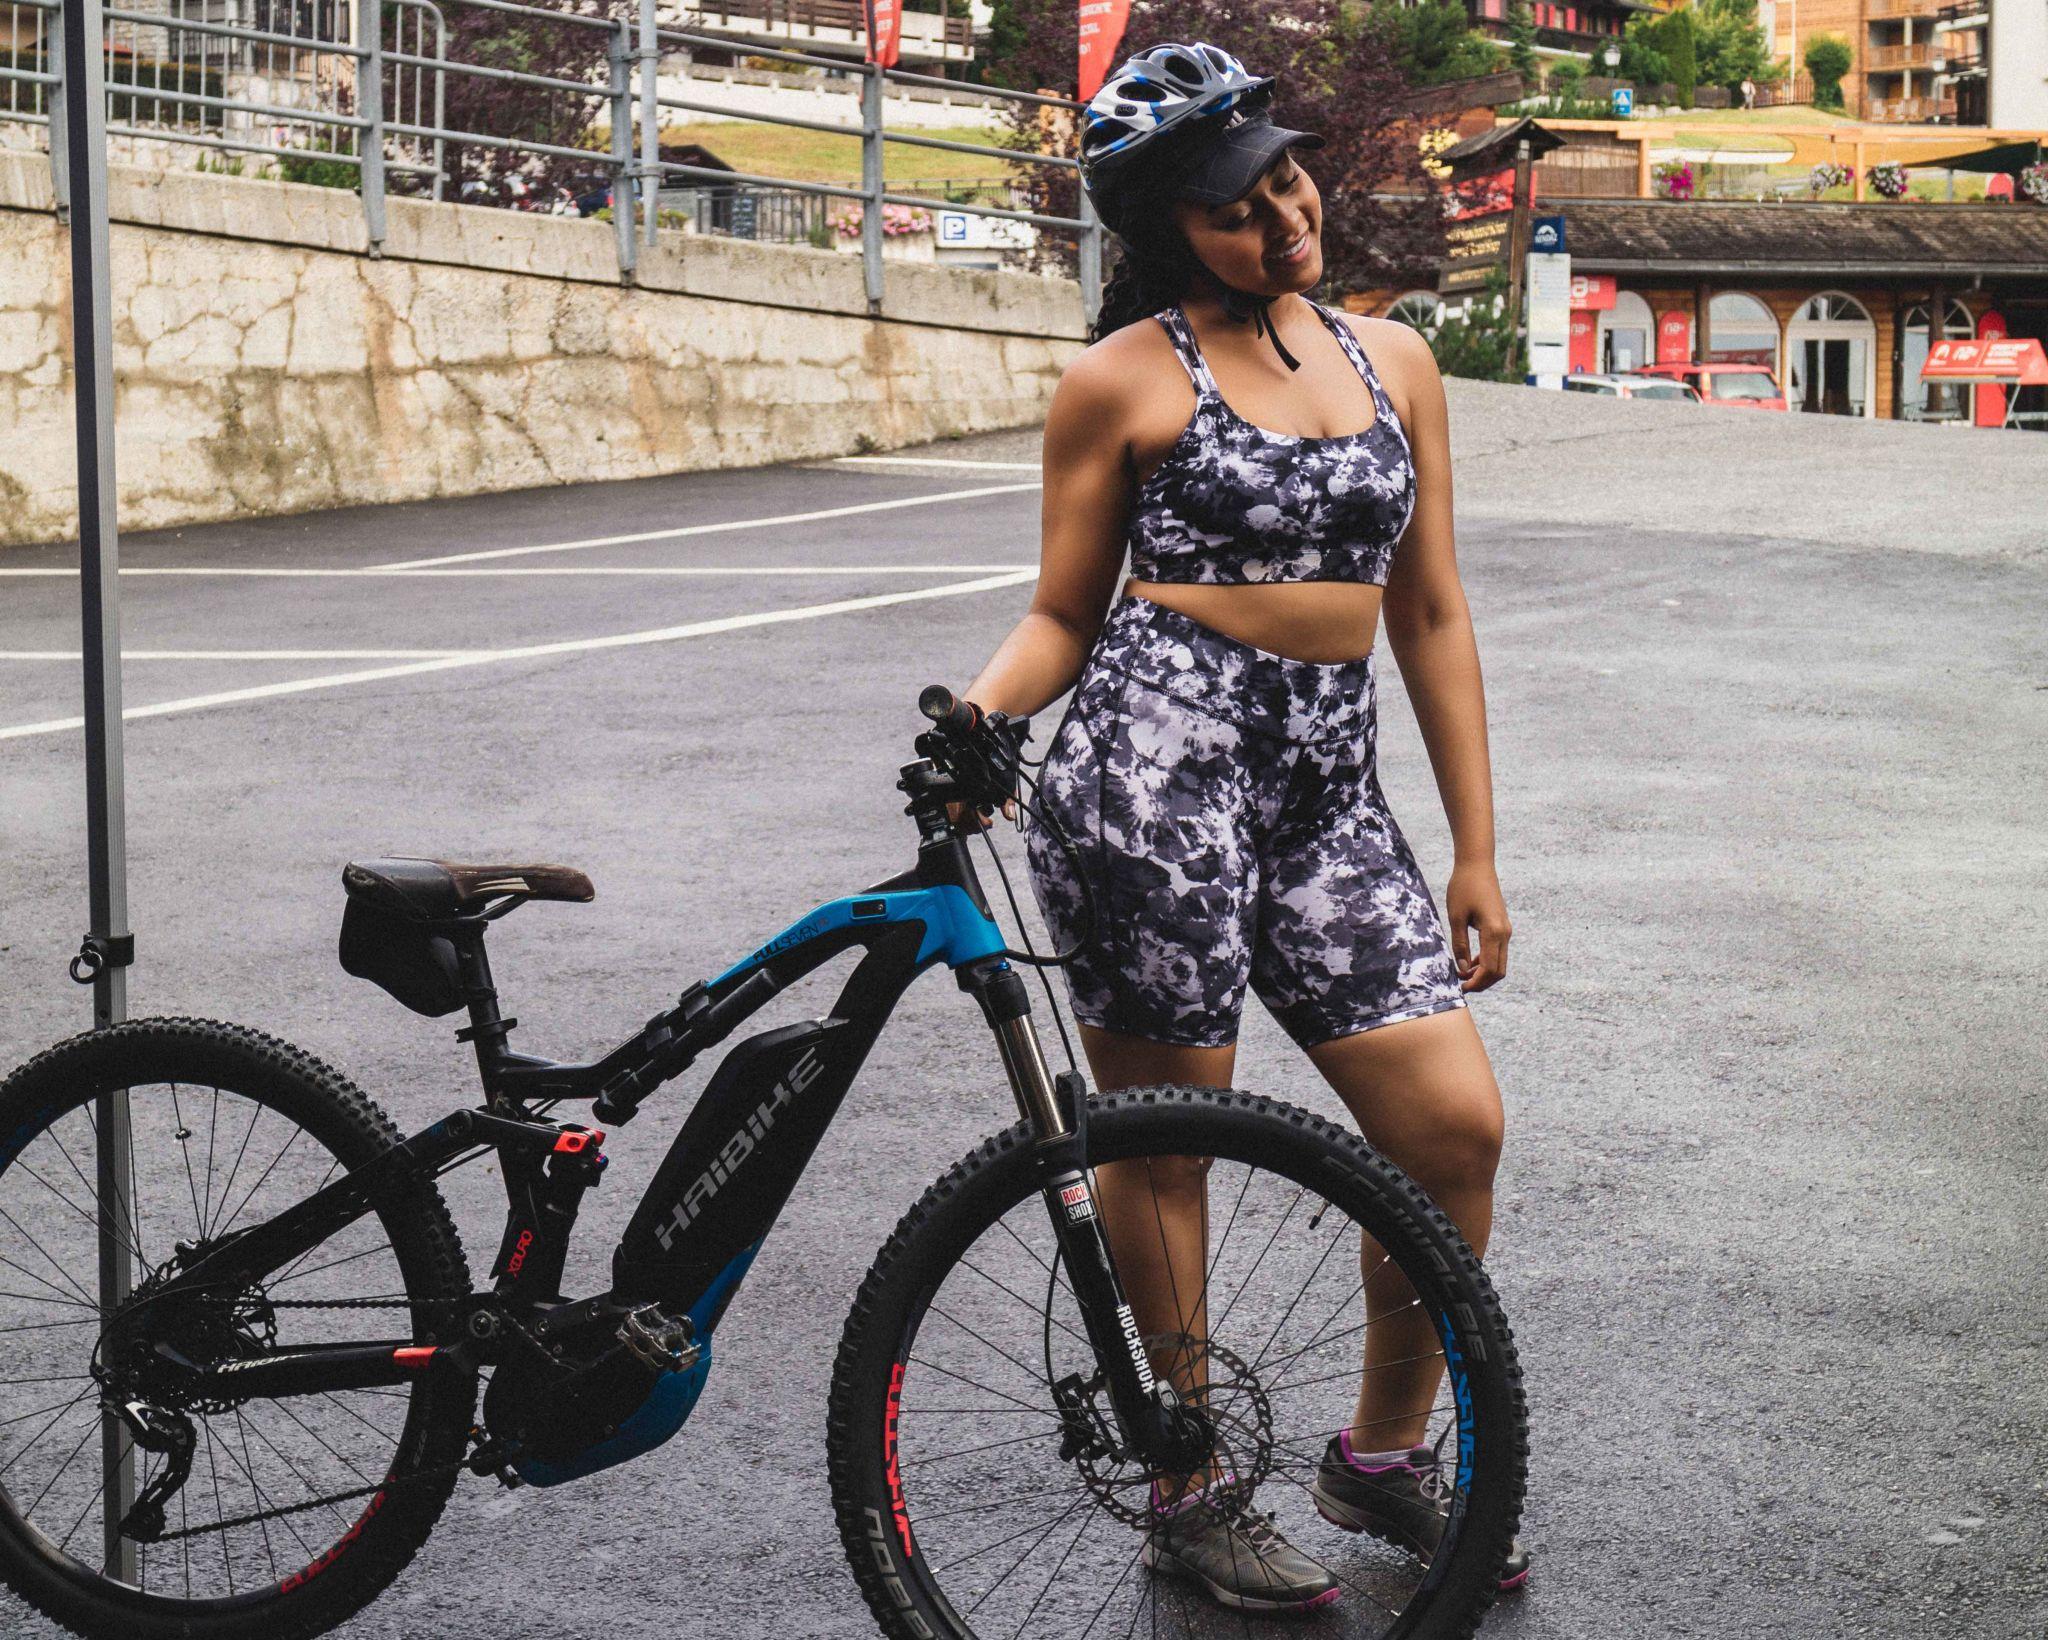 Elaisha-Jade-Mountain-biking-nege.jpg